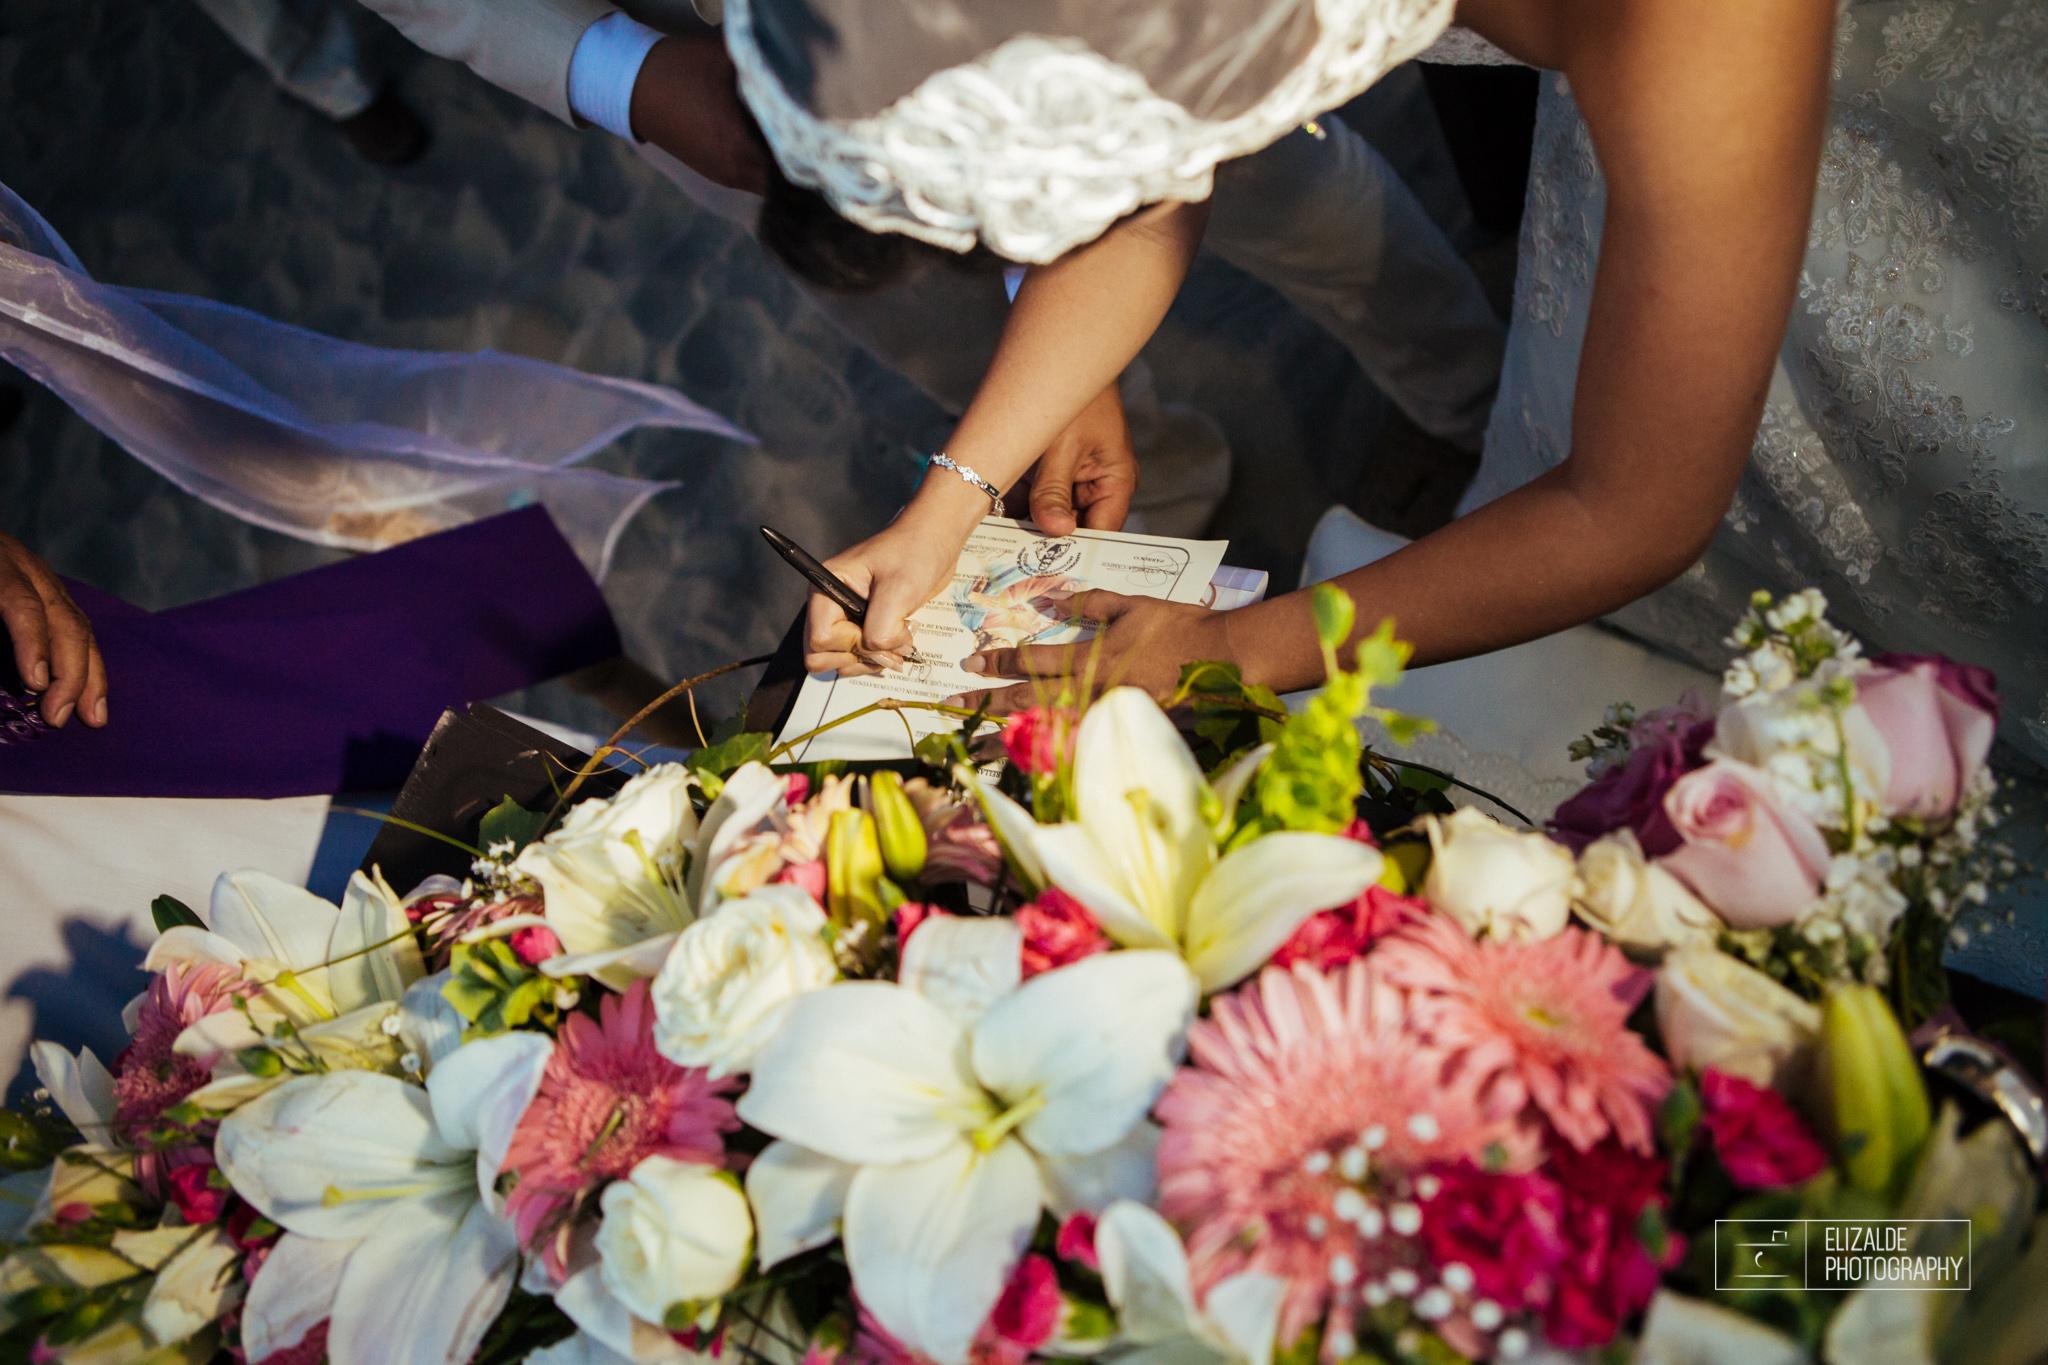 Pay and Ferran_Acapulco_Destination Wedding_Elizalde Photography-104.jpg